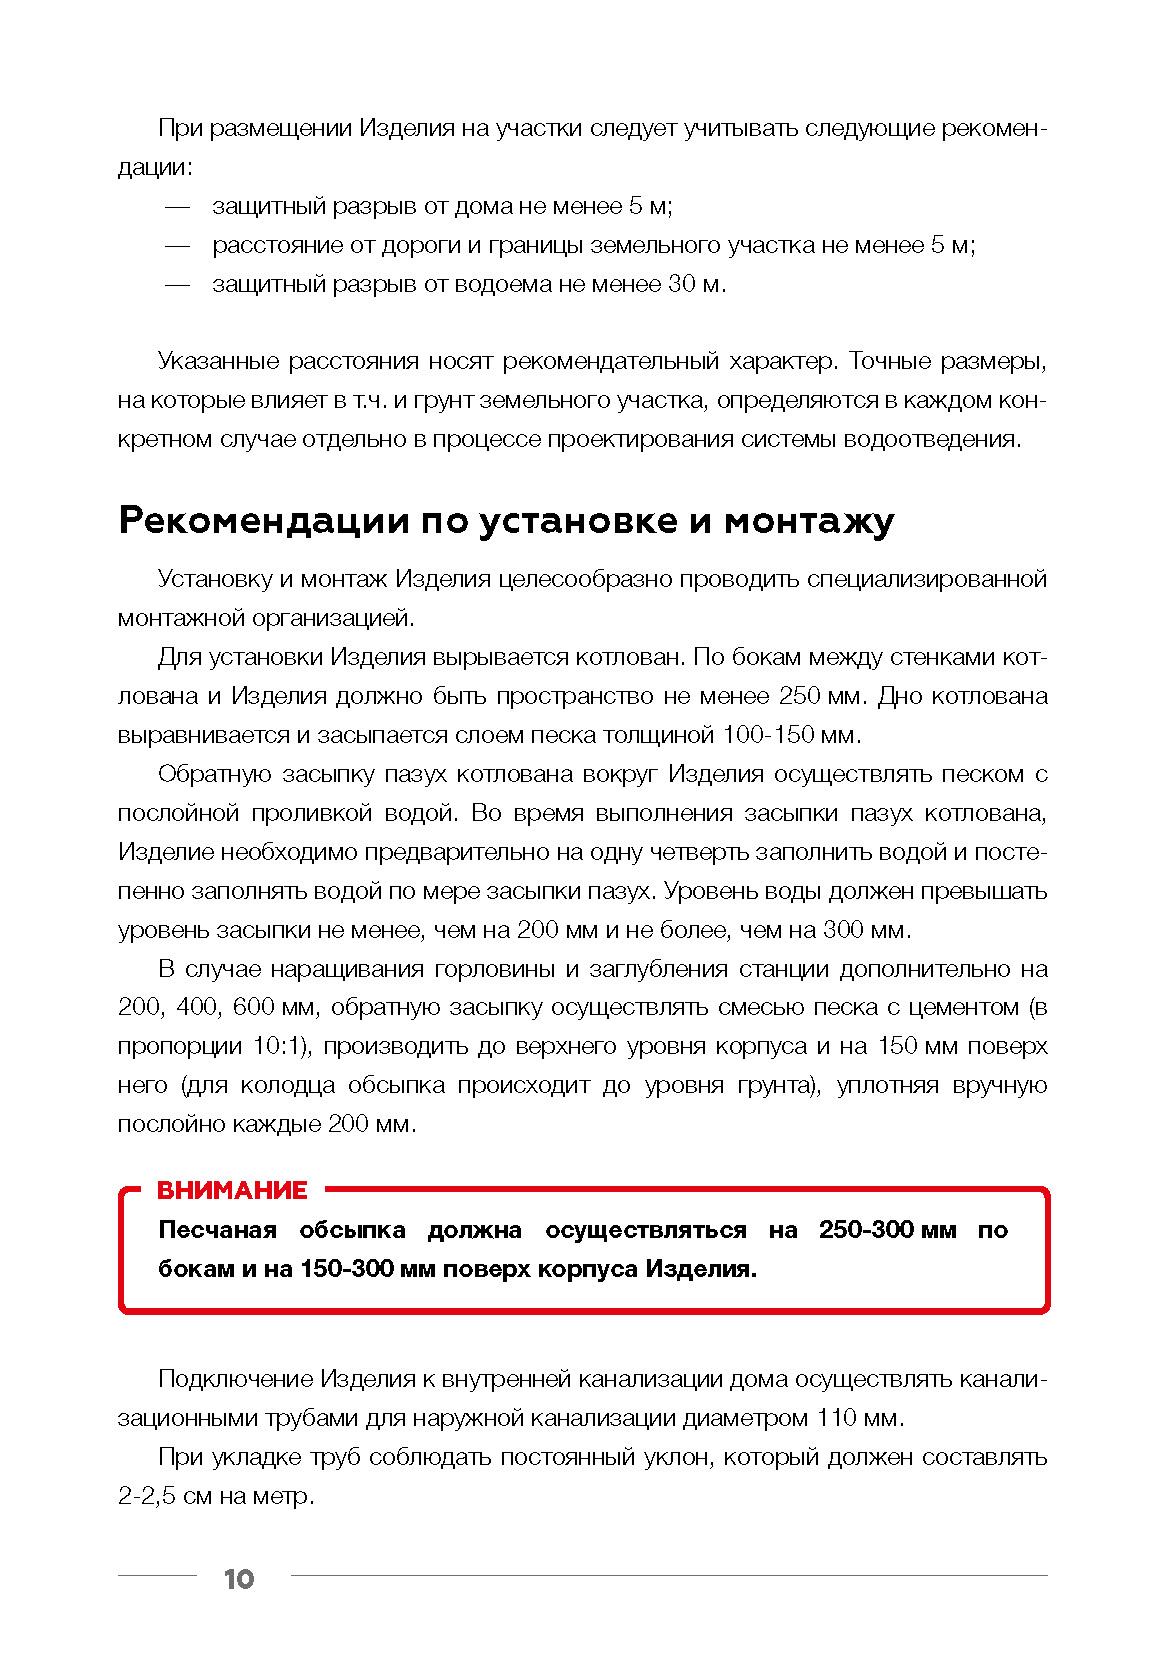 Технический паспорт Евролос Био_Страница_12